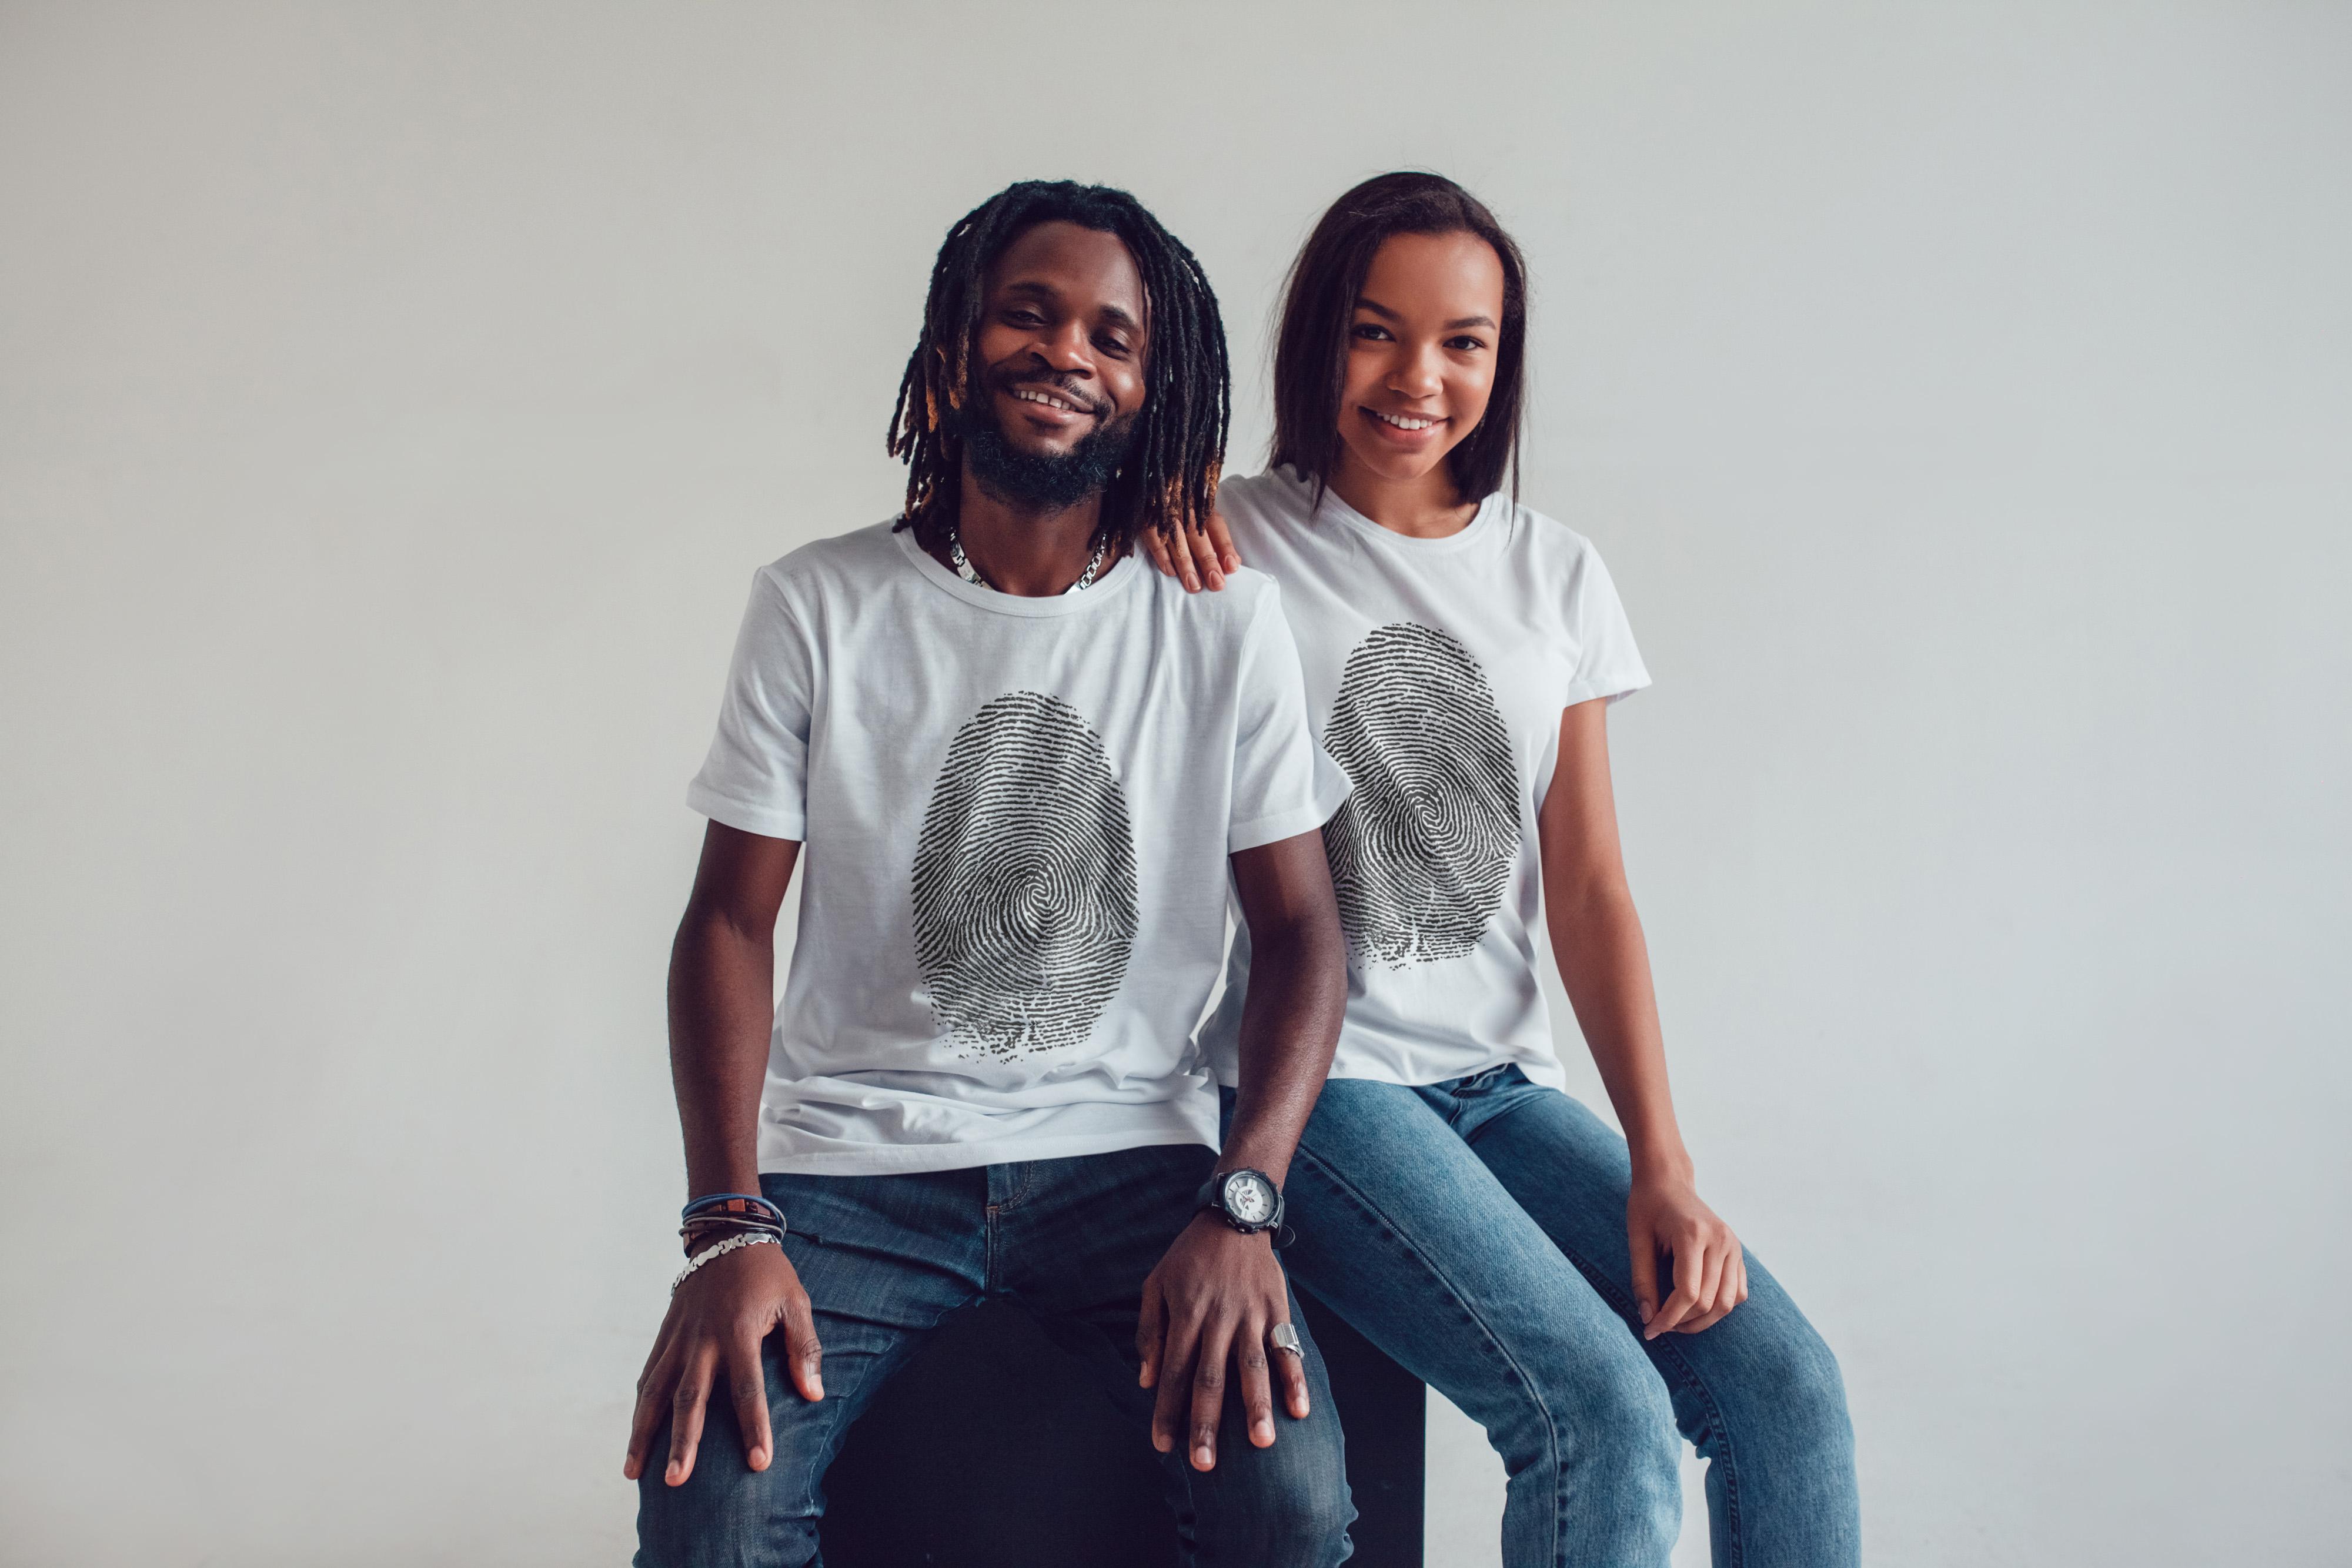 T-Shirt Mock-Up 2018 #1 example image 6